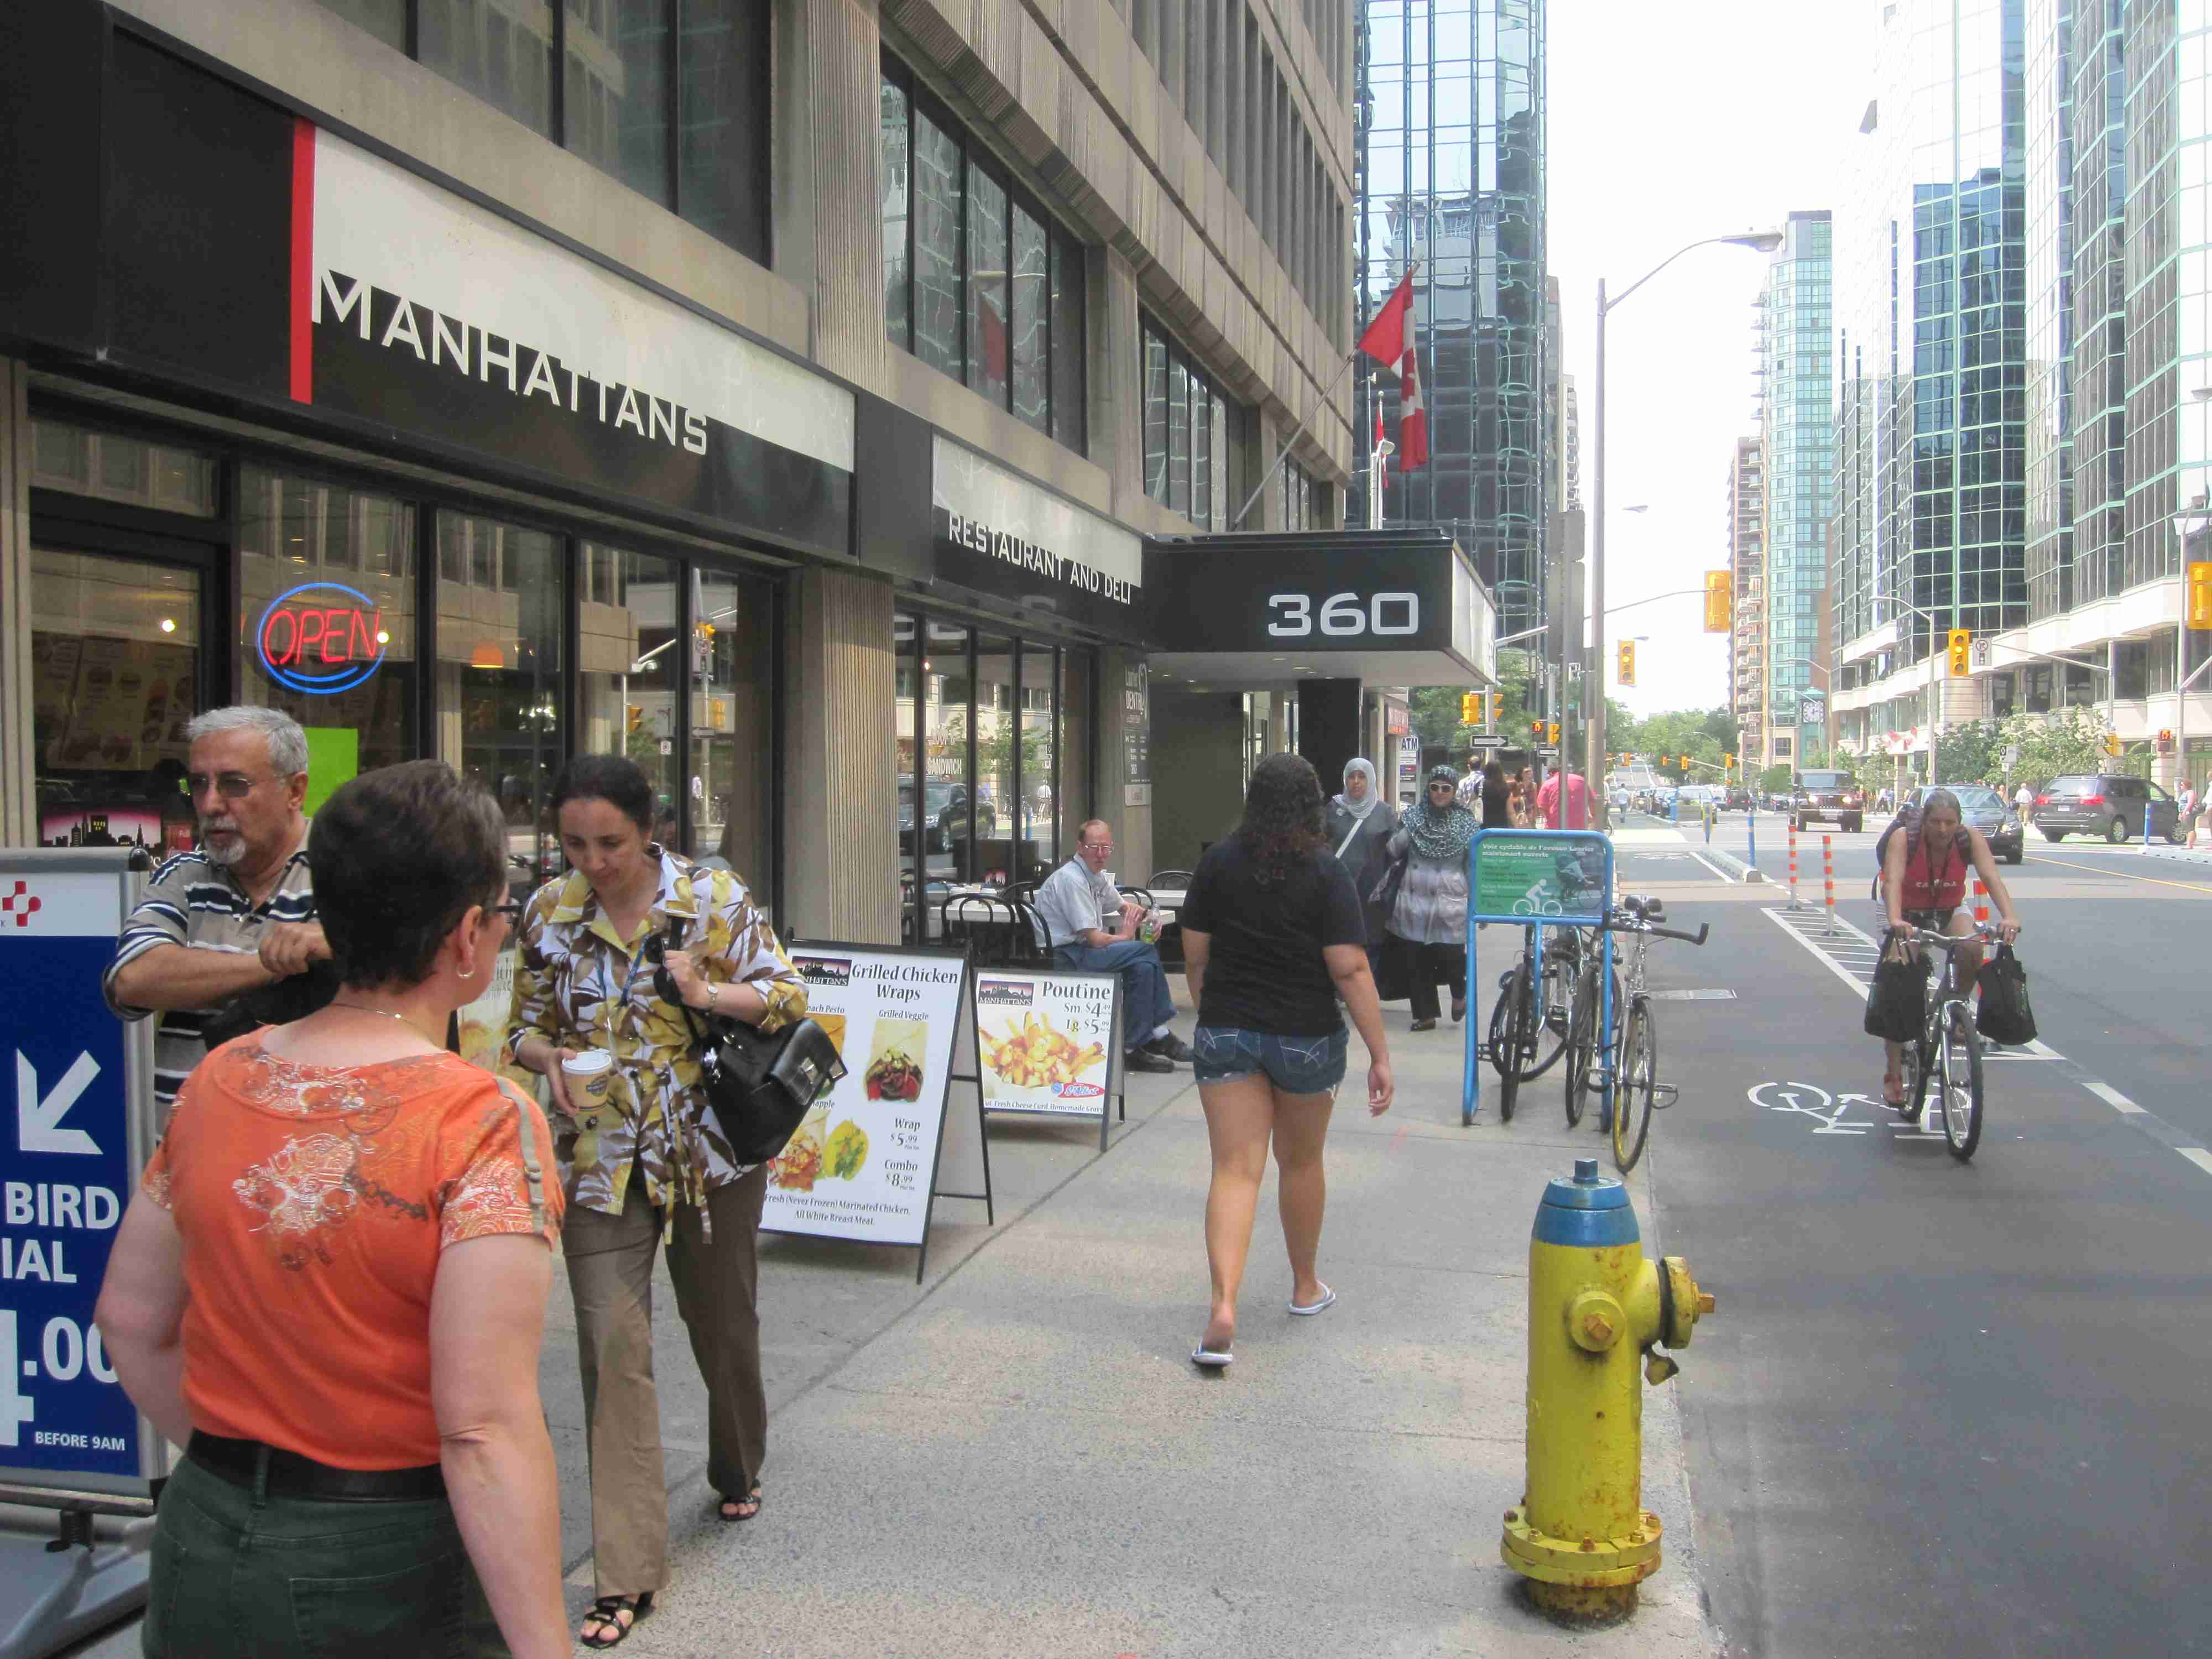 Ottawa Bicycle Culture – 360 Manhattans